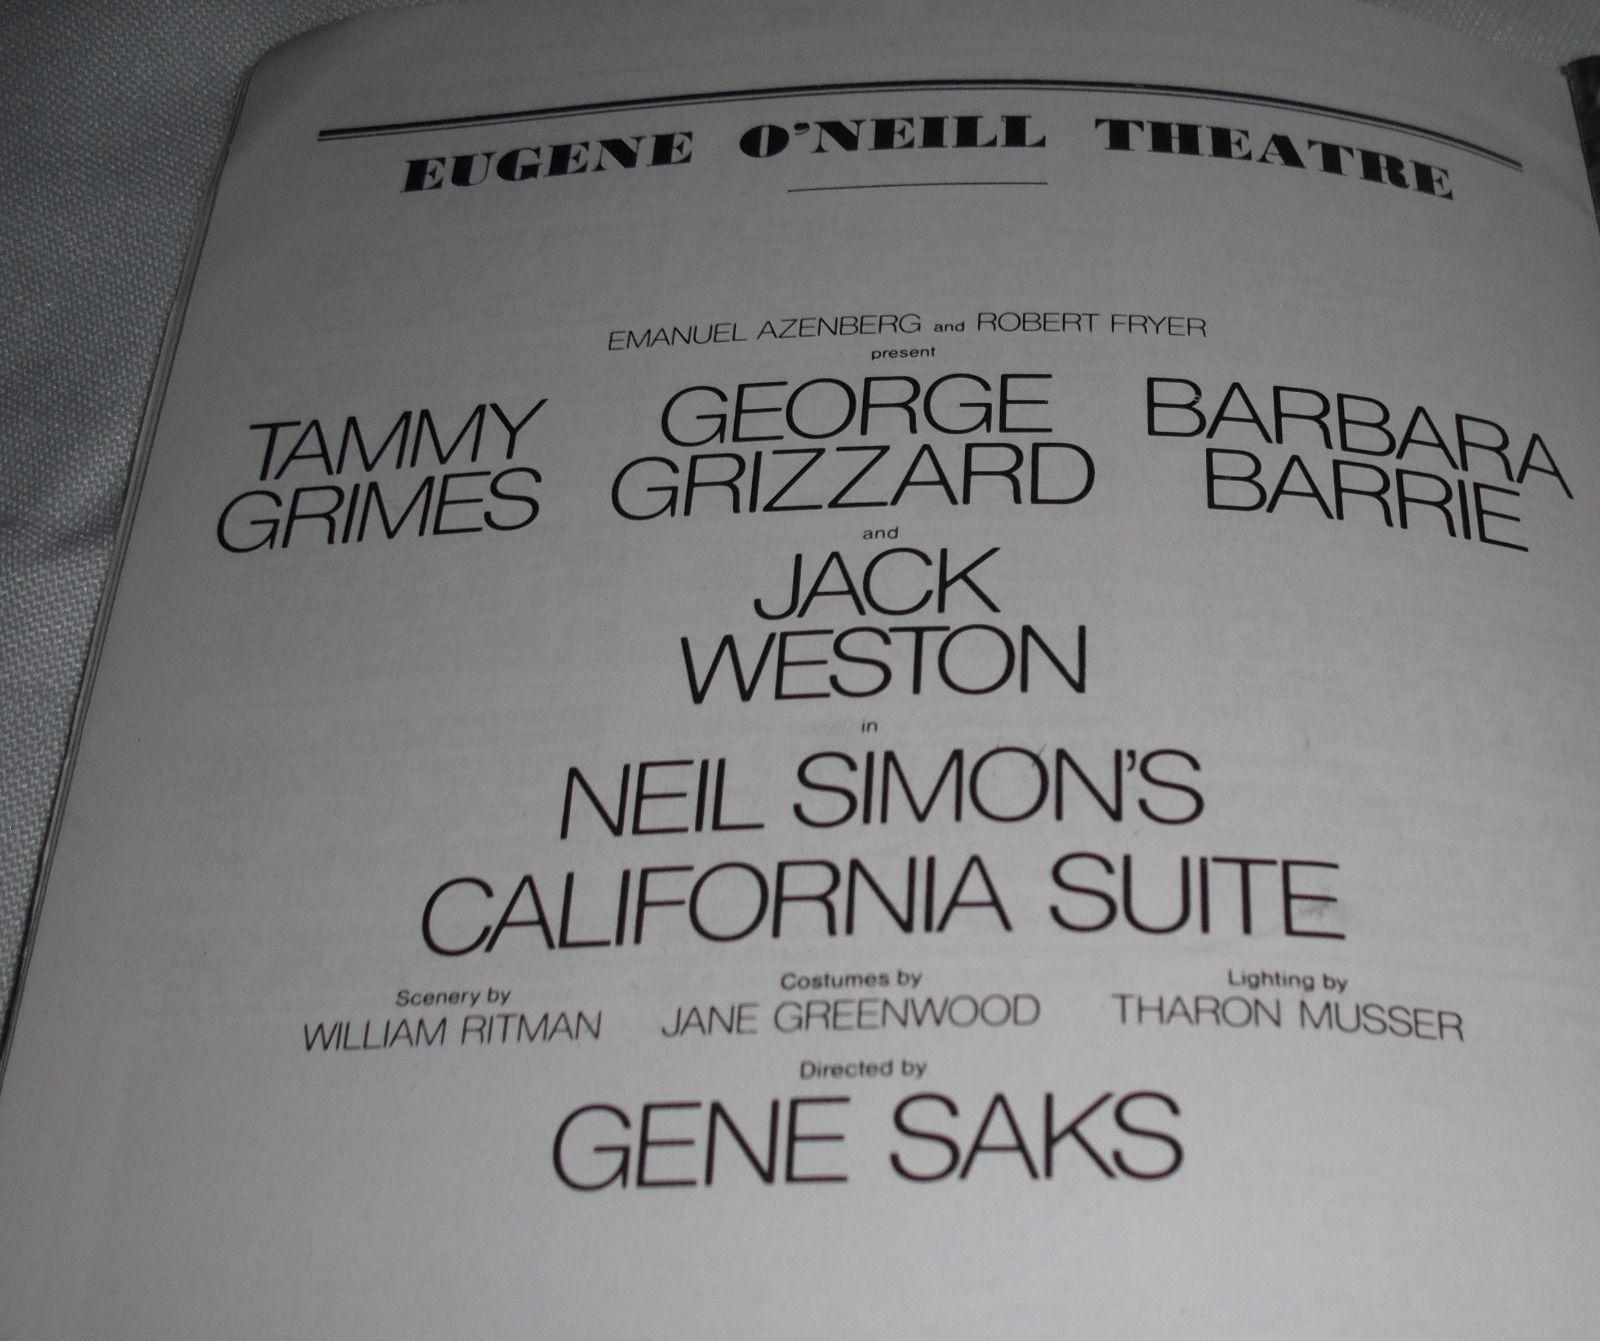 """CALIFORNIA  SUITE"" EUGENE O'NEILL THEATRE JUNE 1976"